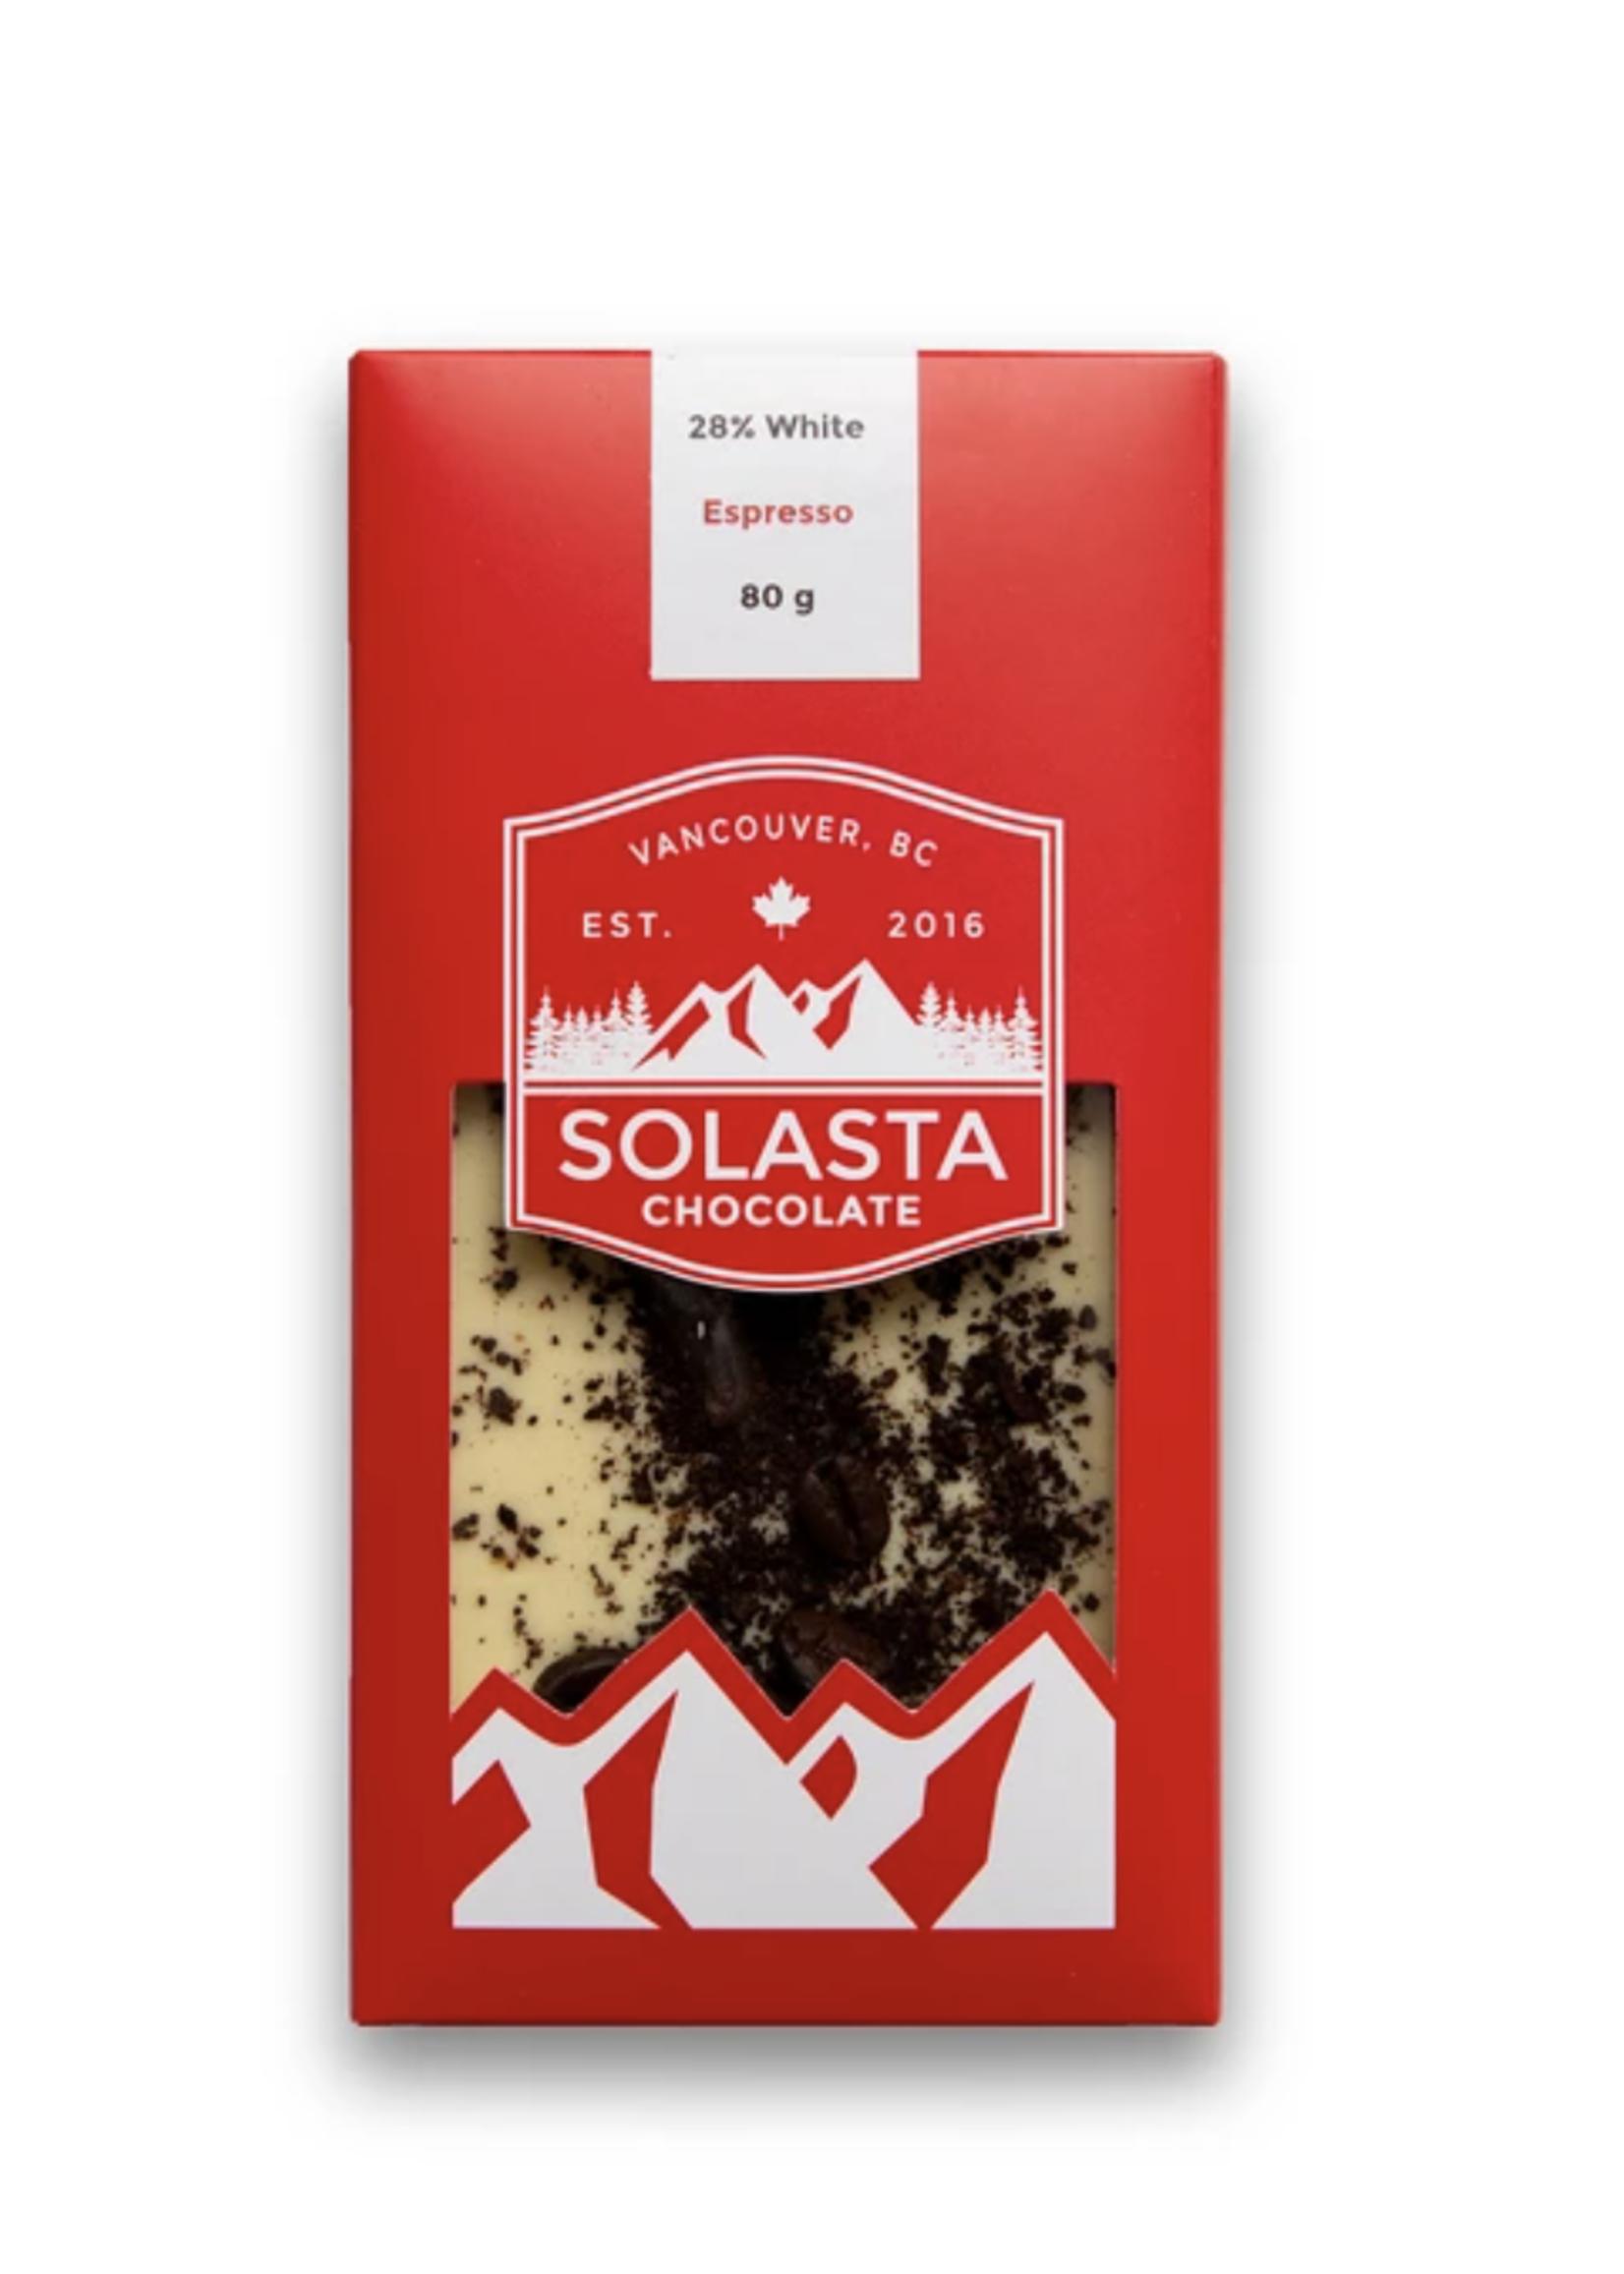 Solasta Chocolate Espresso White Chocolate